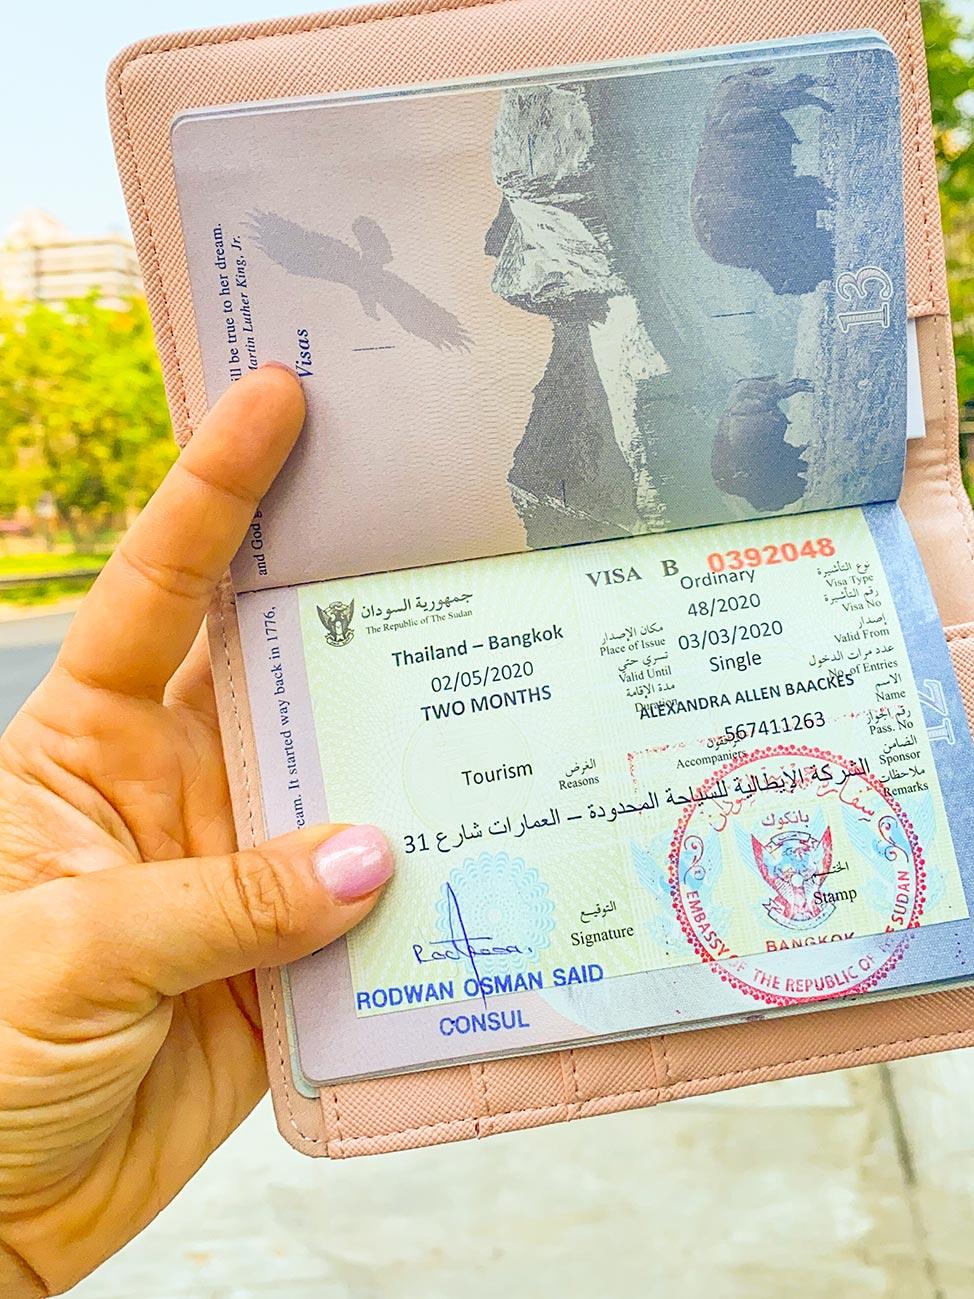 Getting a Sudanese visa in Bangkok